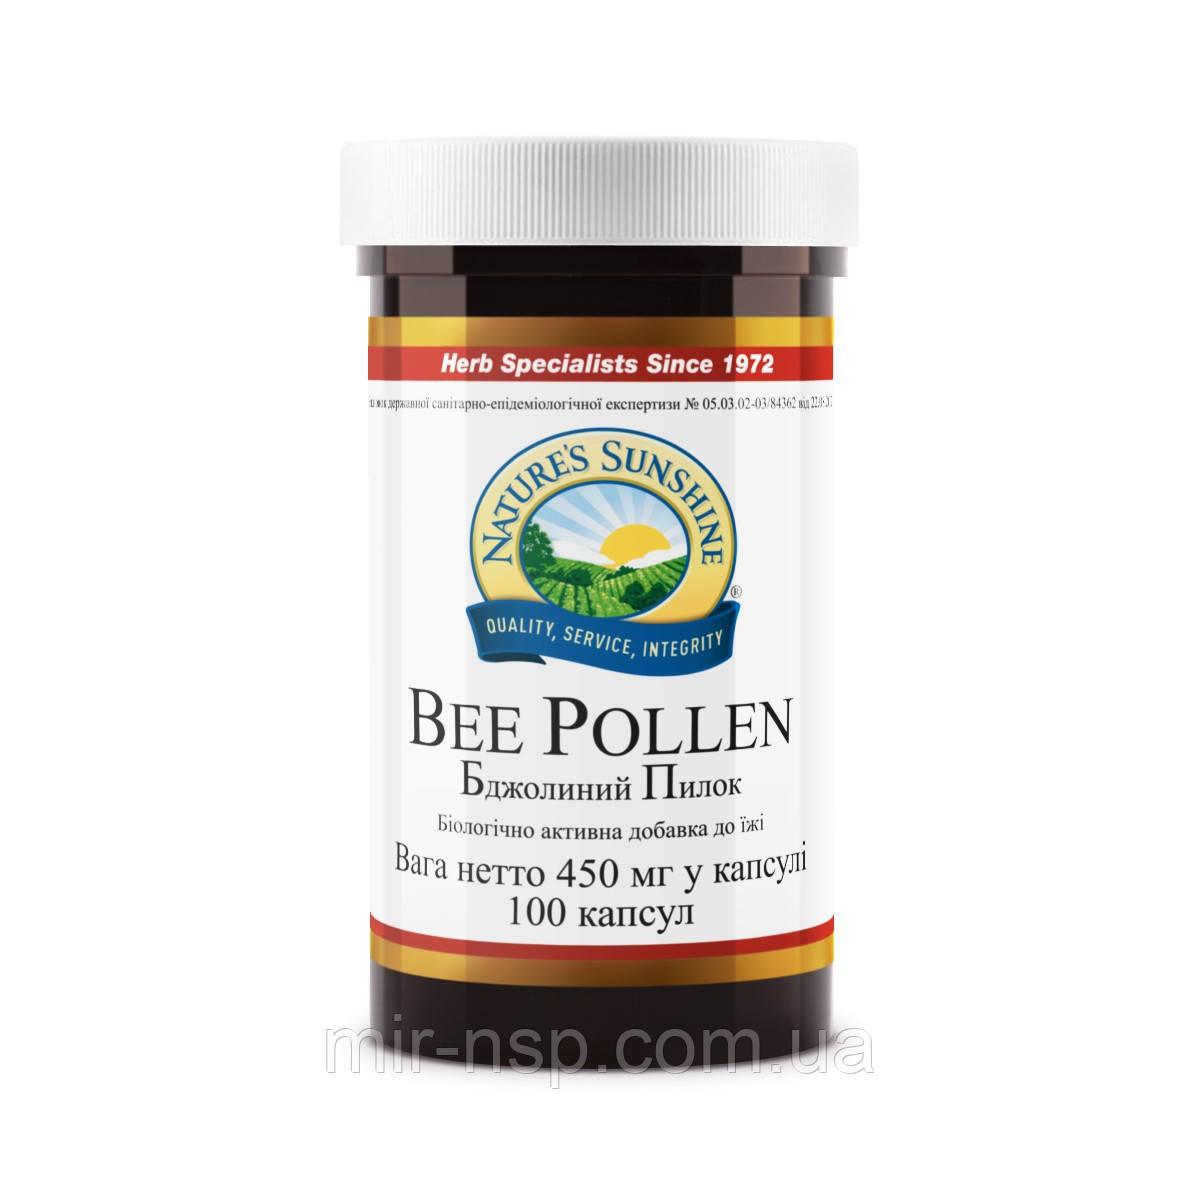 Пчелиная пыльца (Bee Pollen, Би Поллен, би полен, пыльца цветочная) бад NSP